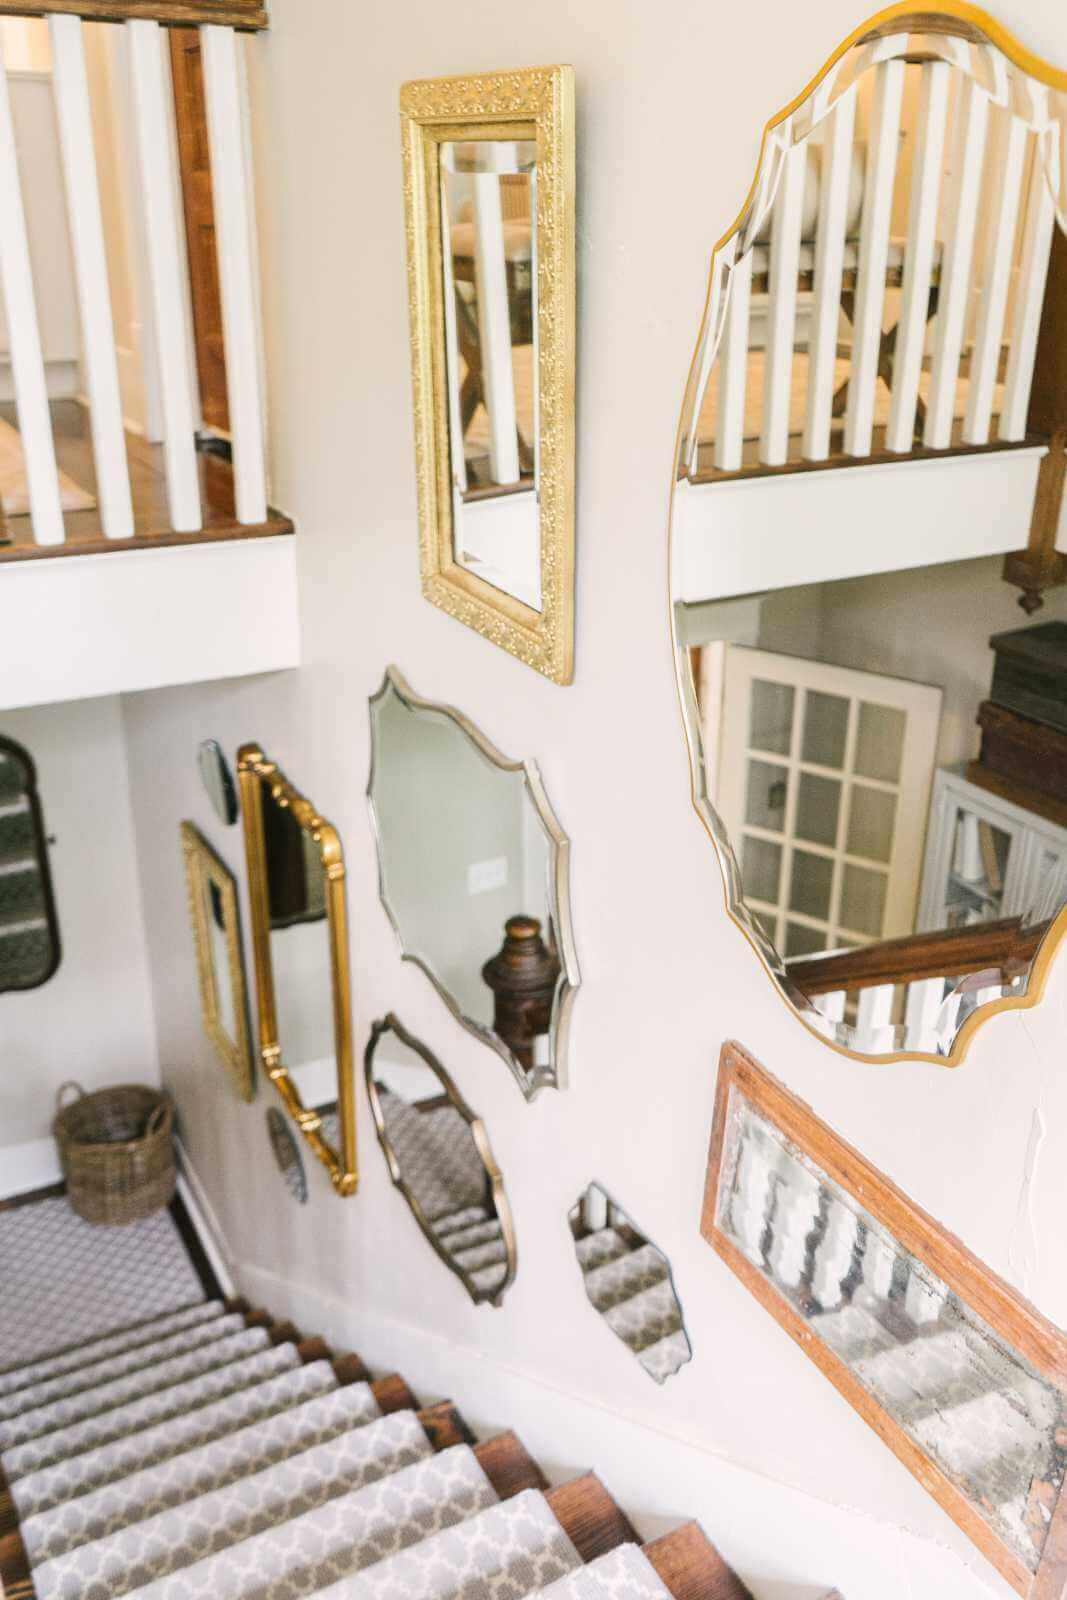 Thistlewood Farms Home Tour-有110年历史的优雅风格农舍-入口通道镜子墙2.jpg